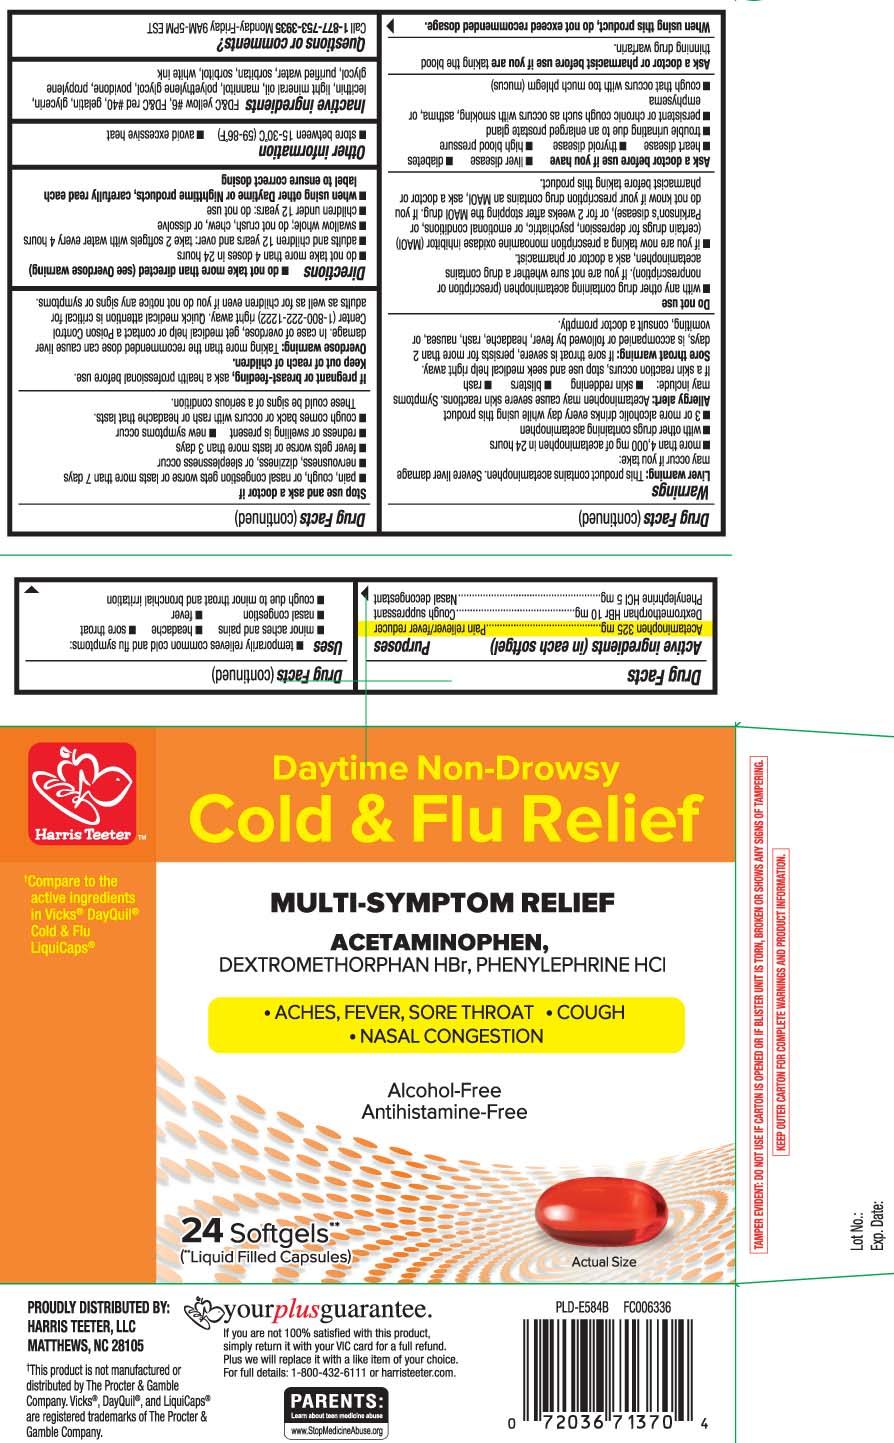 Acetaminophen 325 mg, dextromethorphan HBr 10 mg, Phenylephrine HCL 10 mg